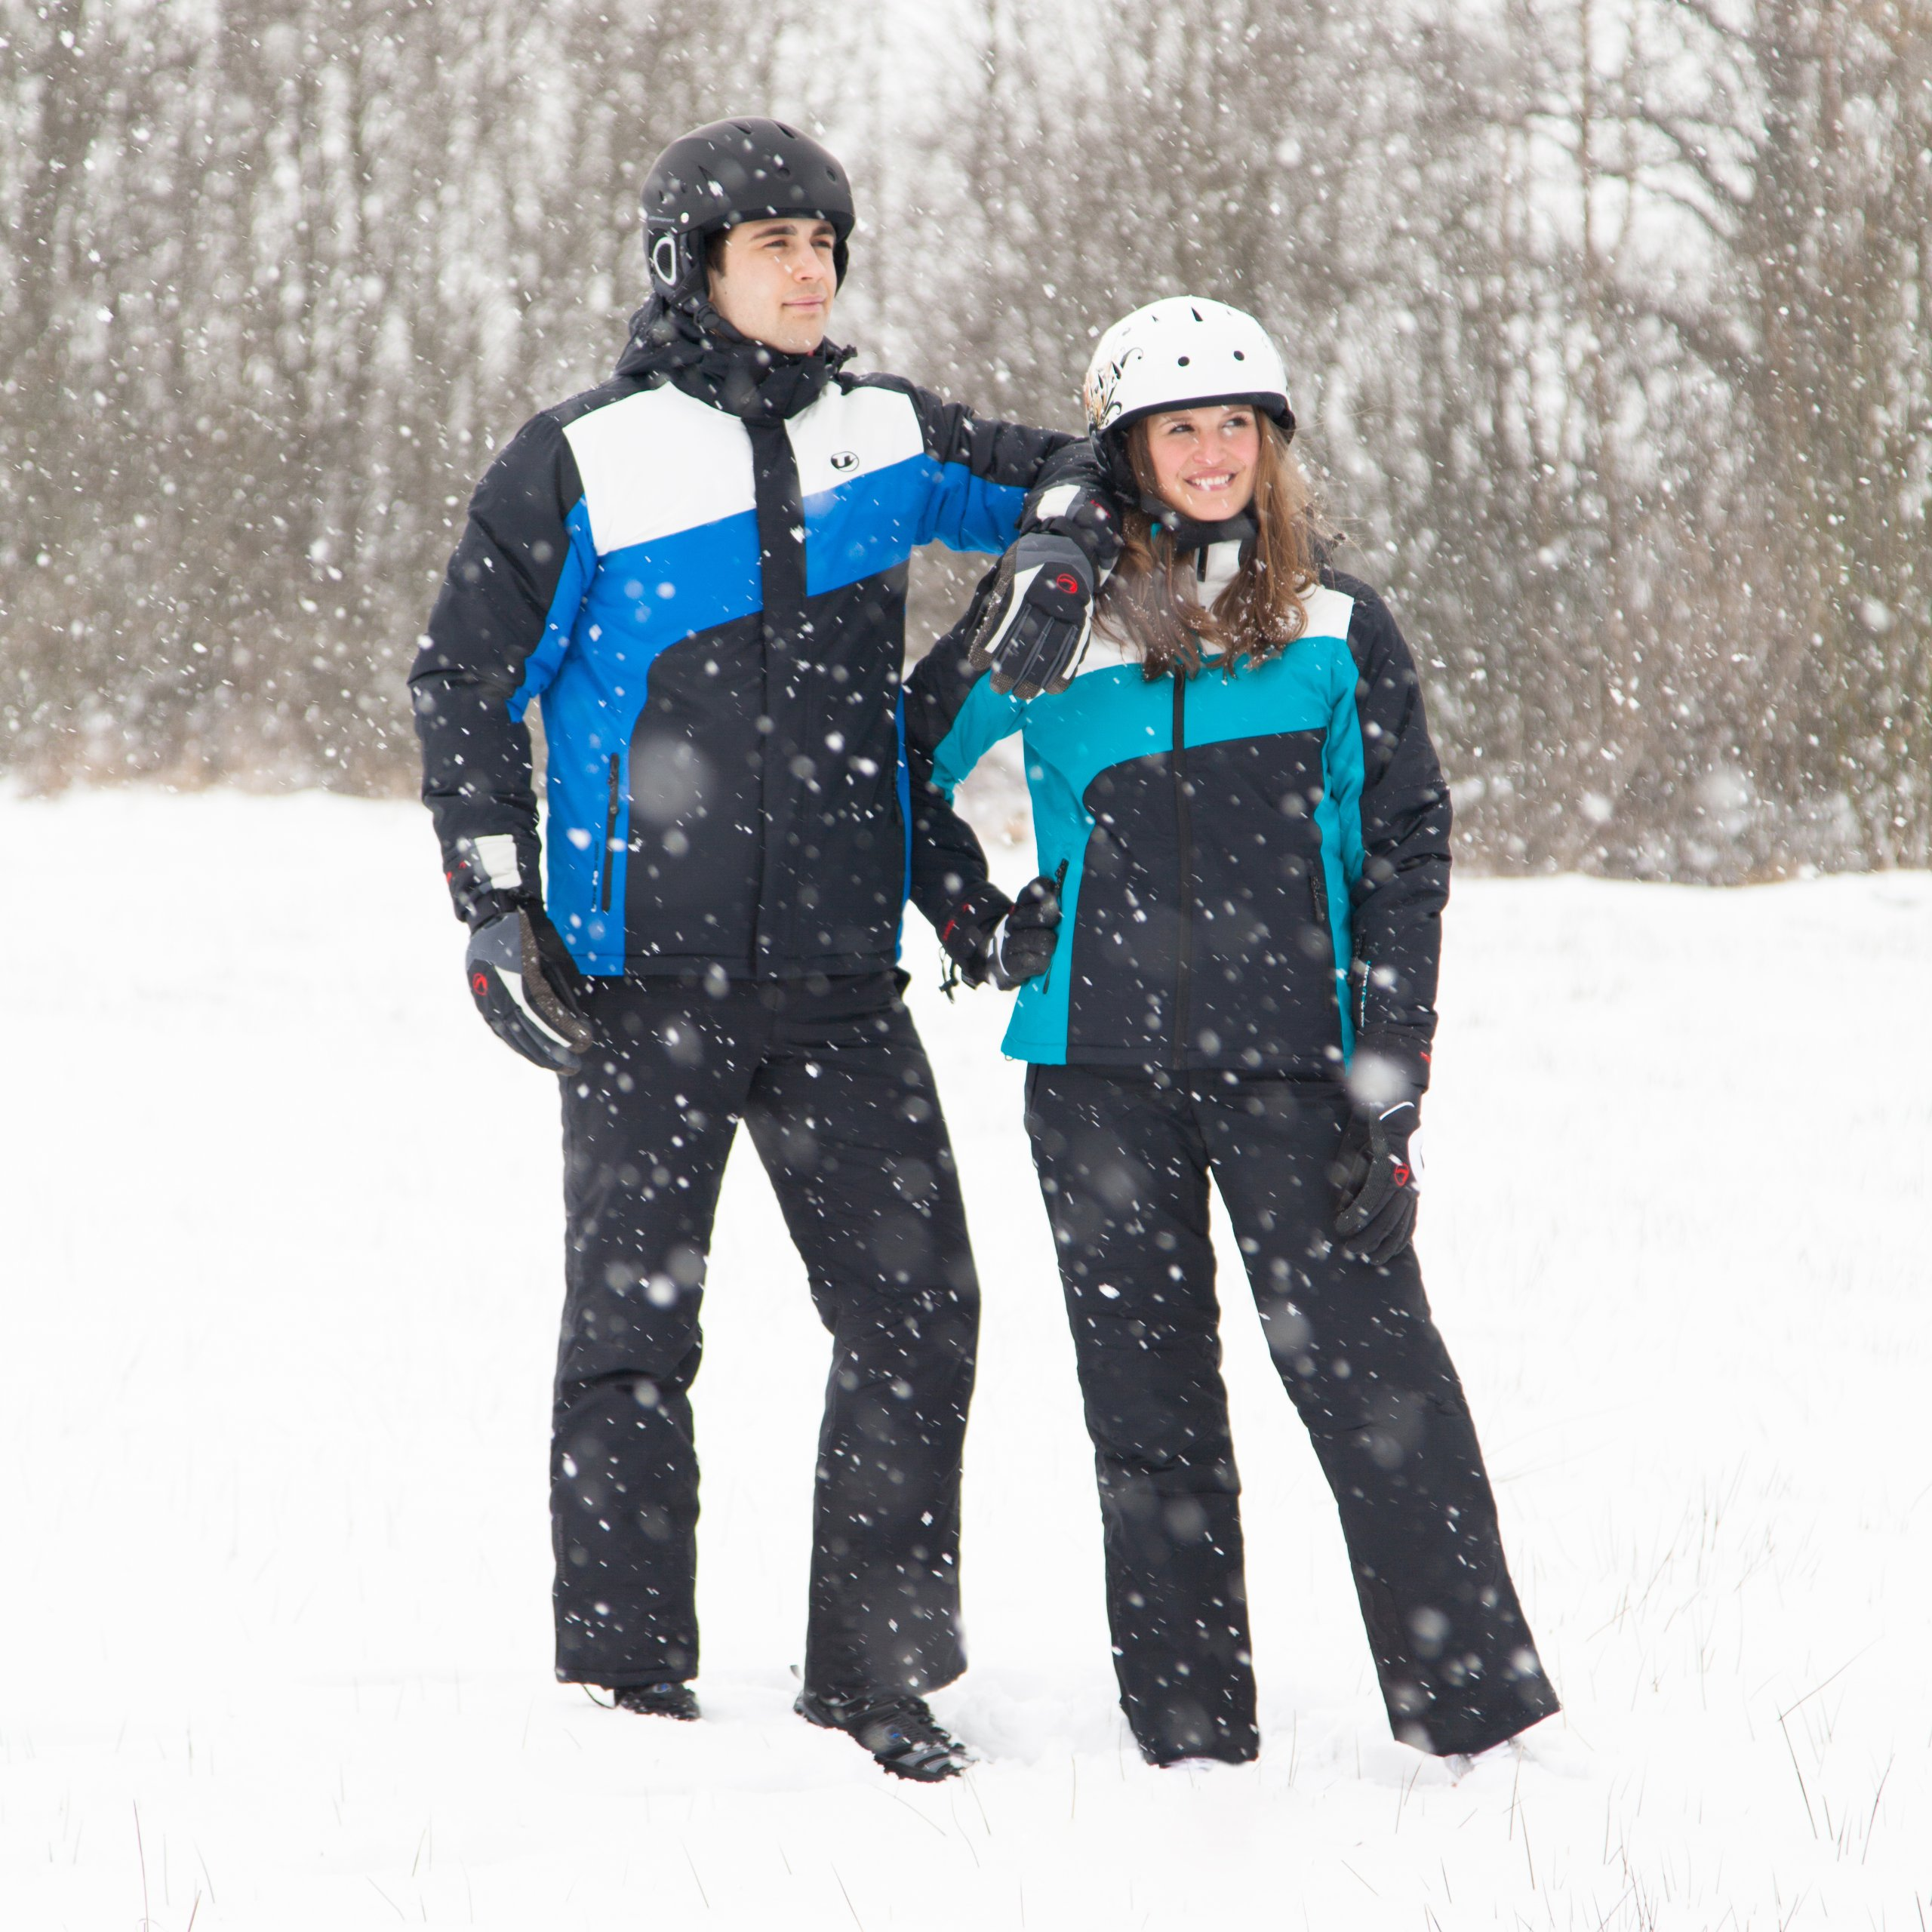 28190d47540 Ultrasport Casco da Sci Snowboard Race Edition – ULTRASPORT ITALIA ...